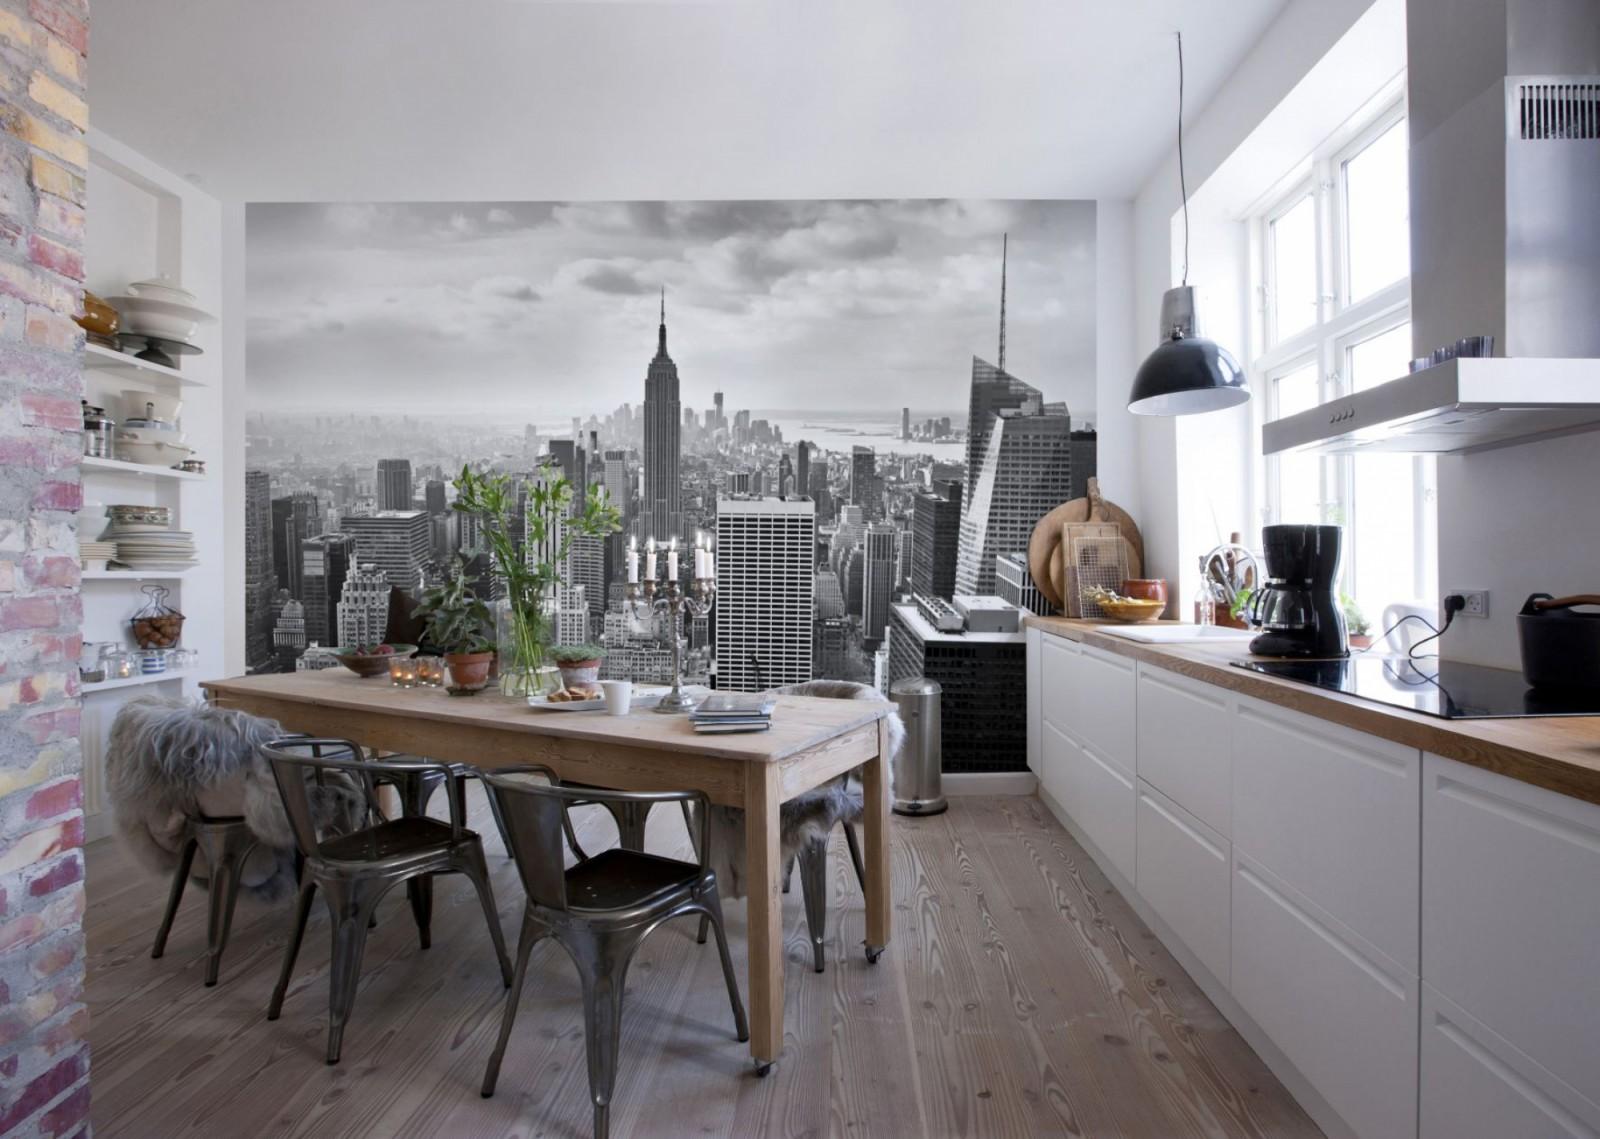 Интерьер кухни фотообоями 171